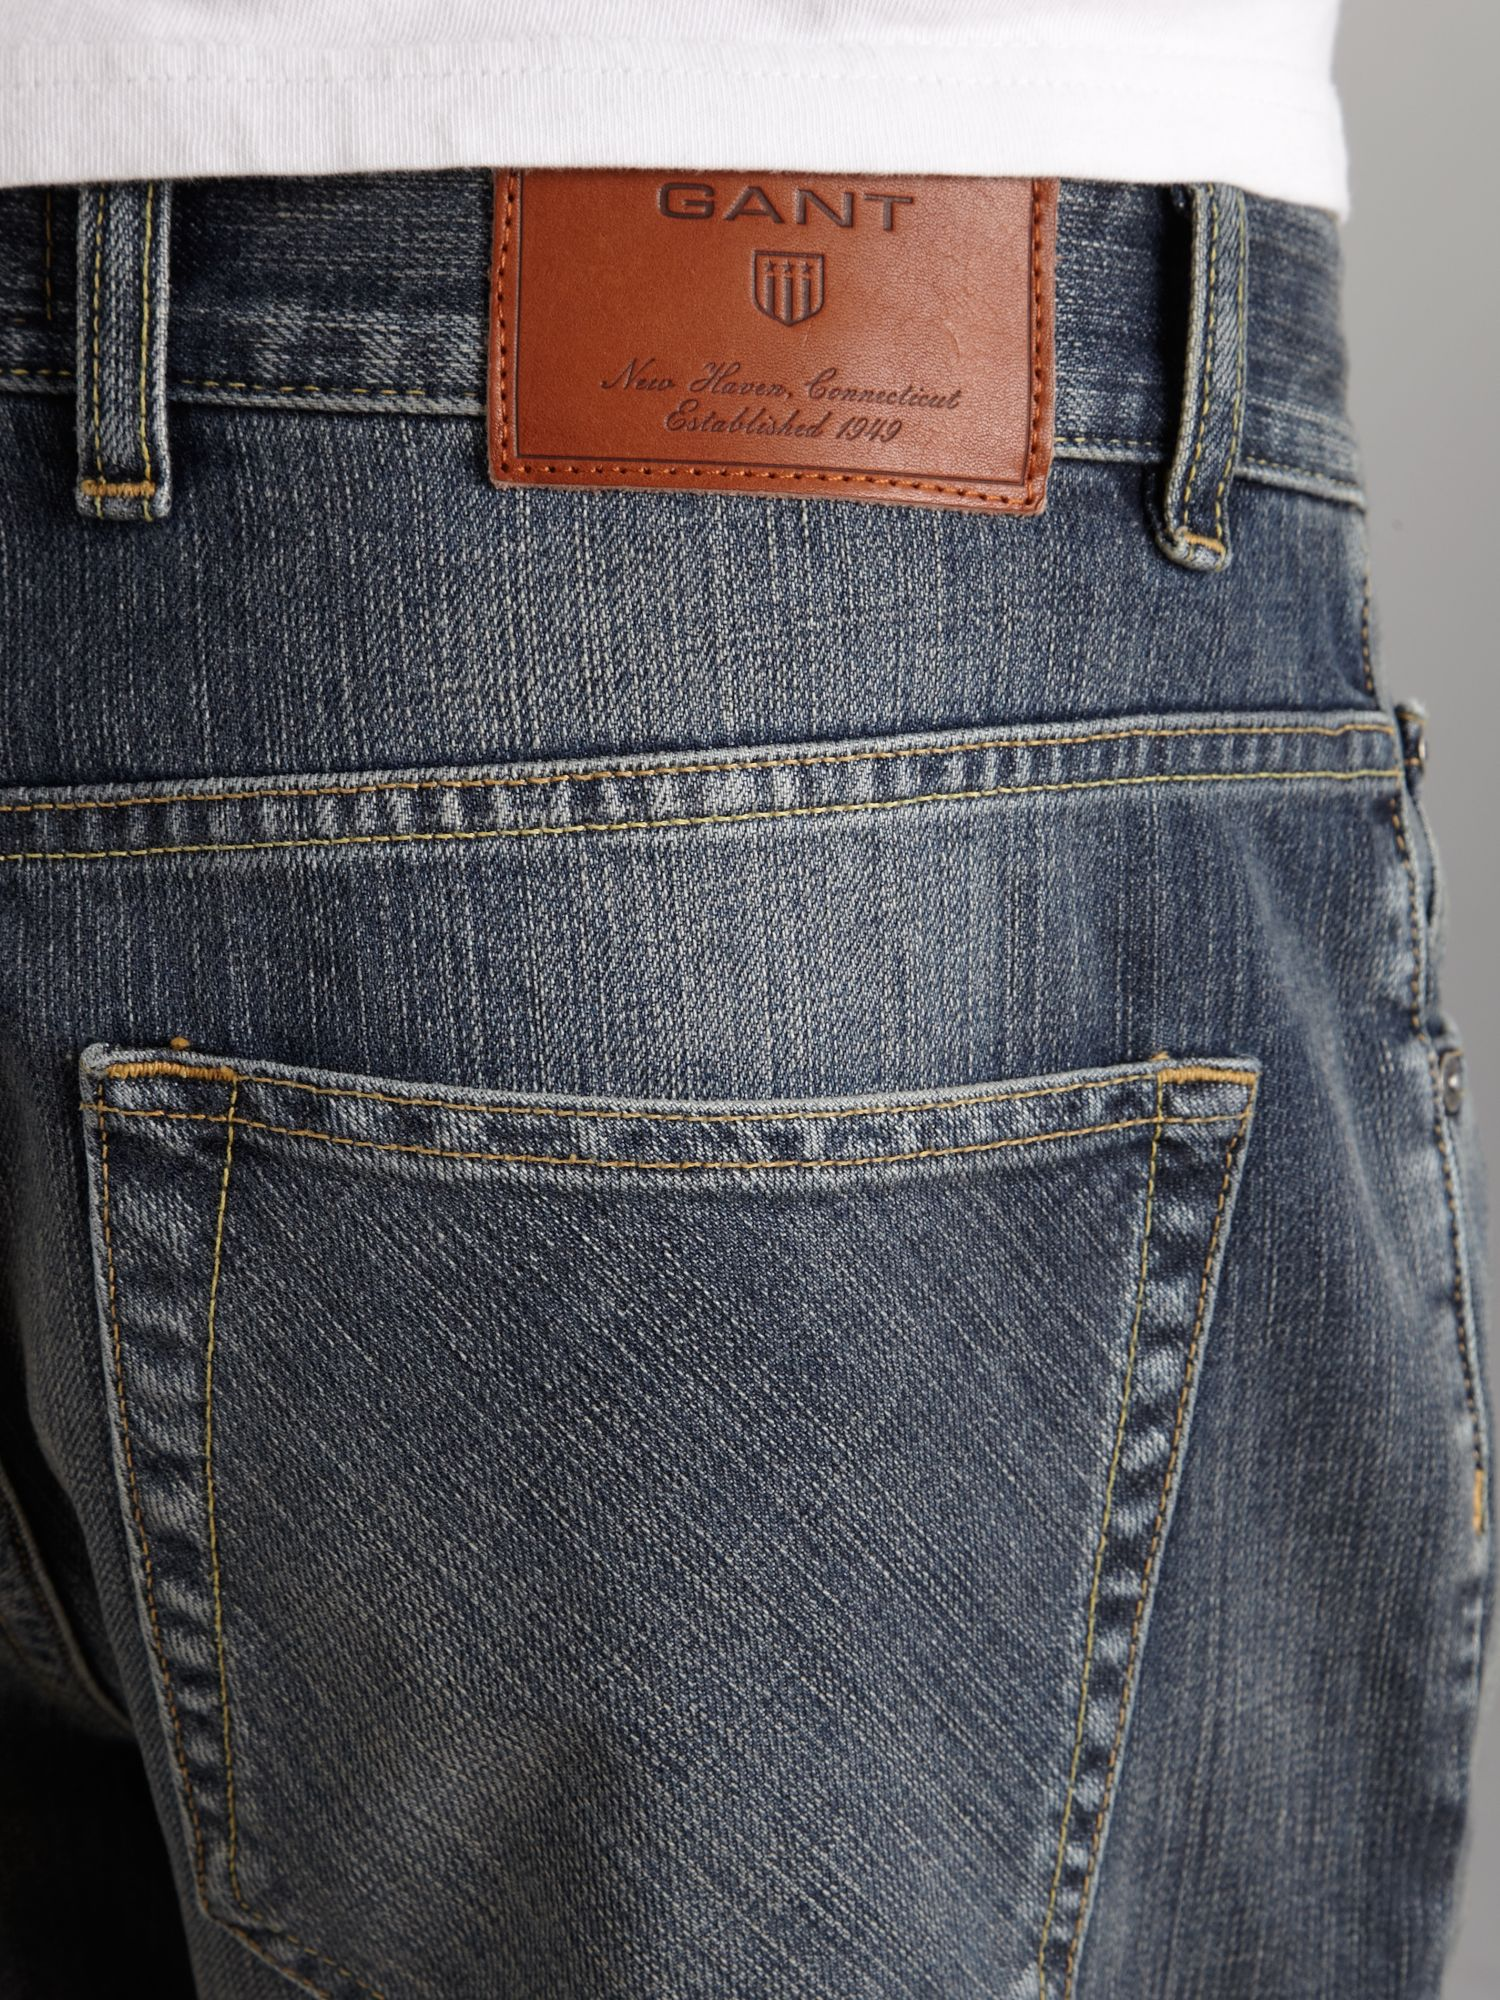 GANT Slim Fit Long Island Jeans in Mid Blue (Blue) for Men